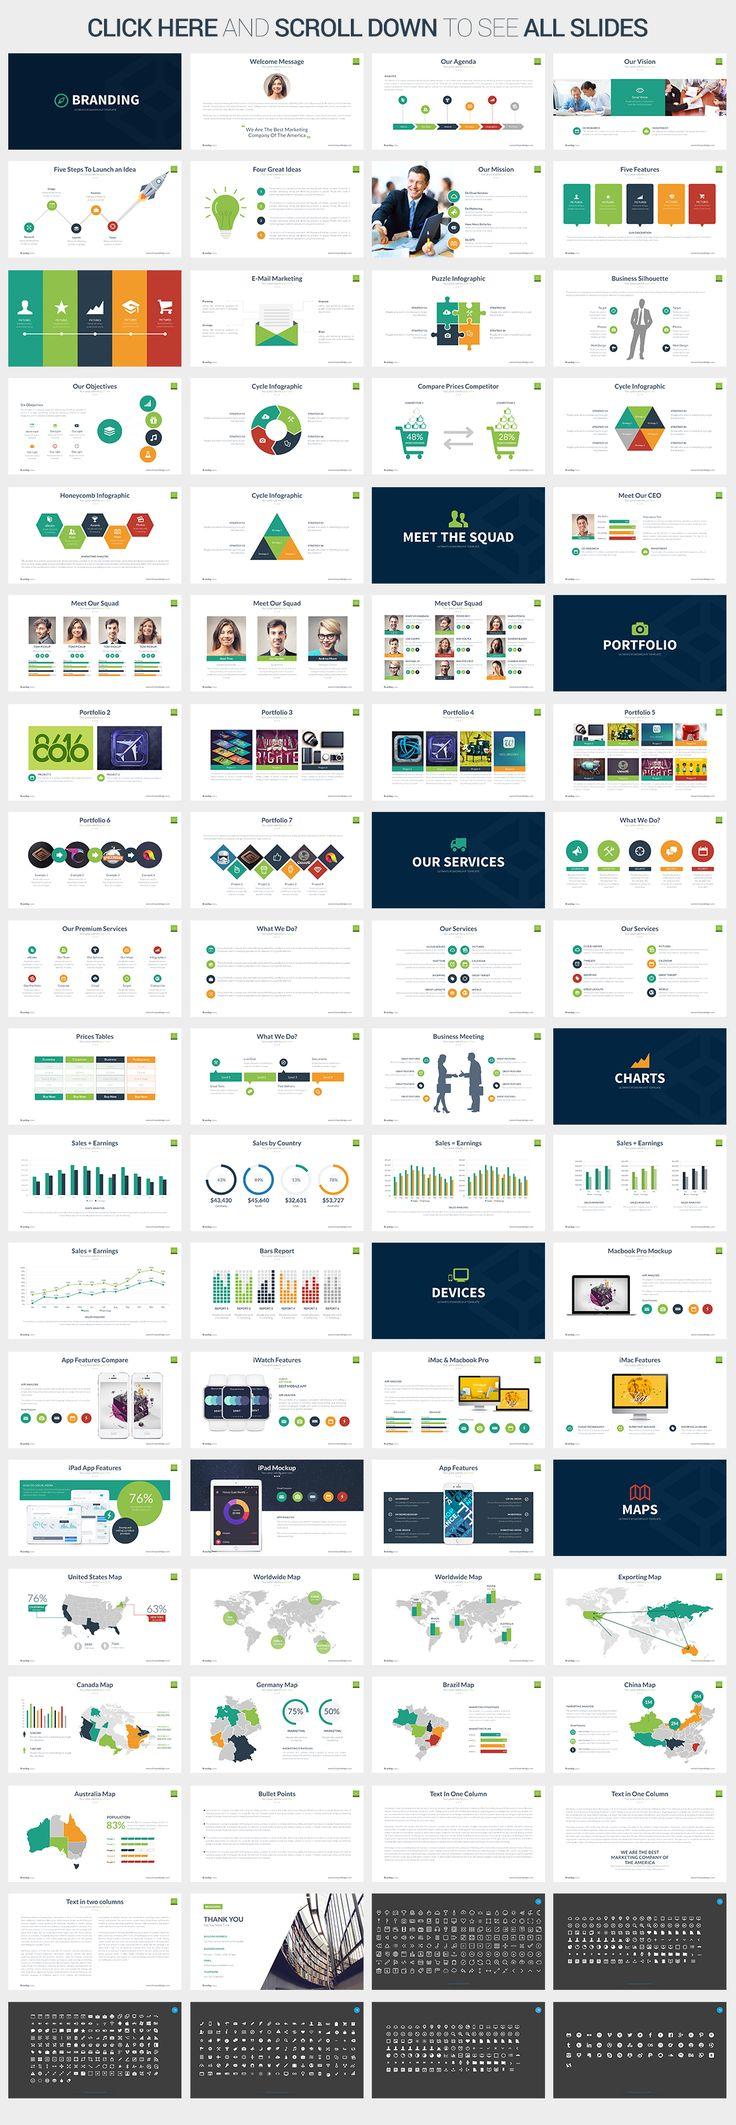 Branding Powerpoint Template by SlidePro on @creativemarket